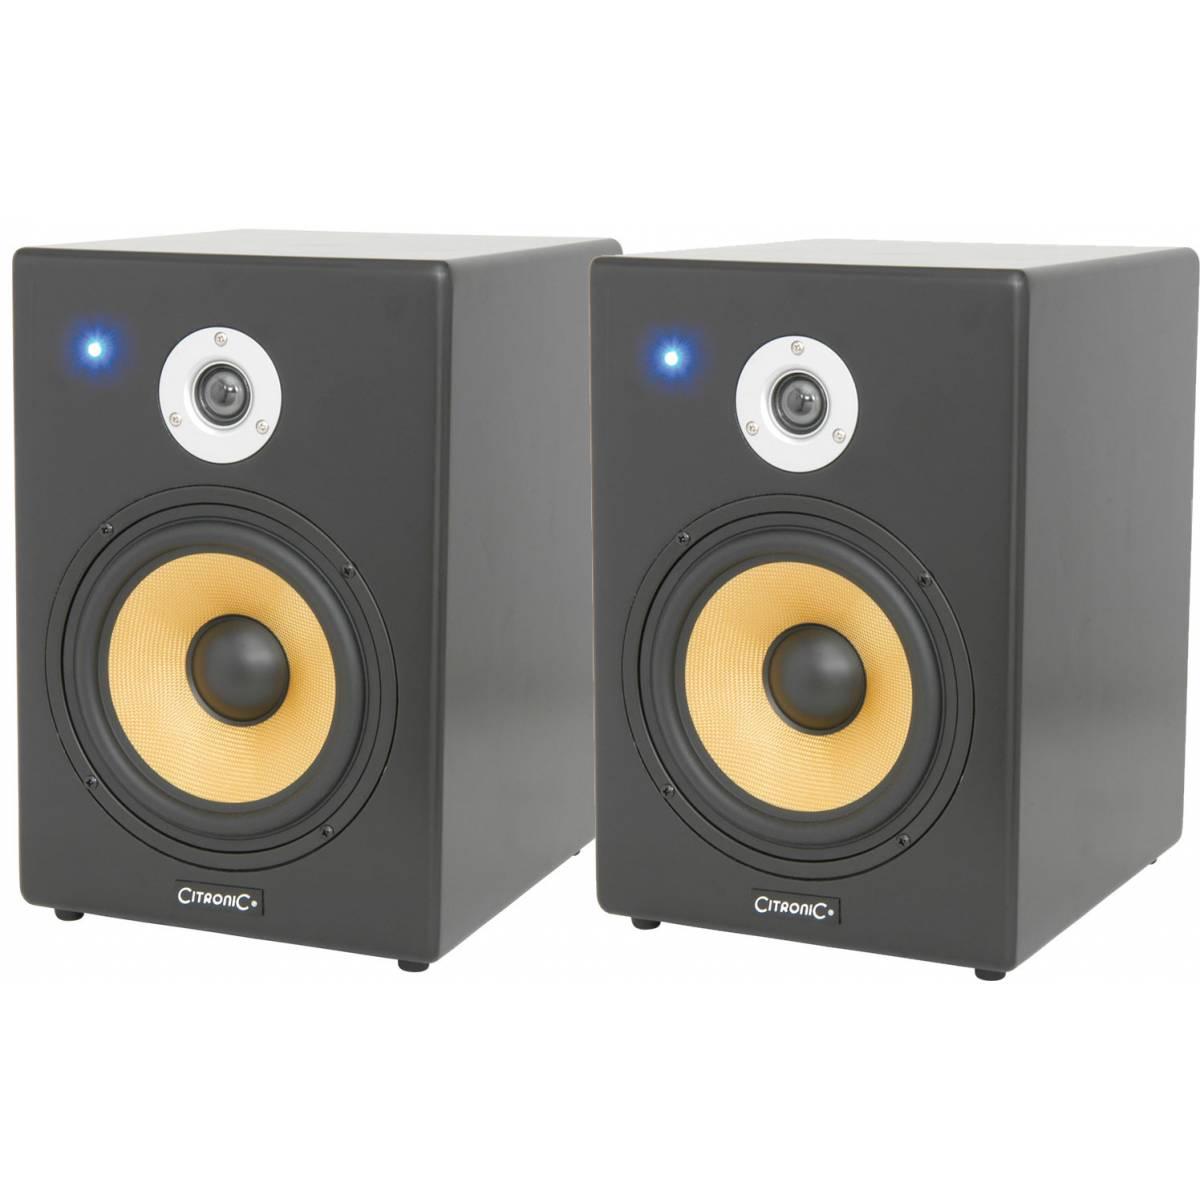 citronic st8 mkii active studio monitors pair studio monitor speakers from inta audio uk. Black Bedroom Furniture Sets. Home Design Ideas